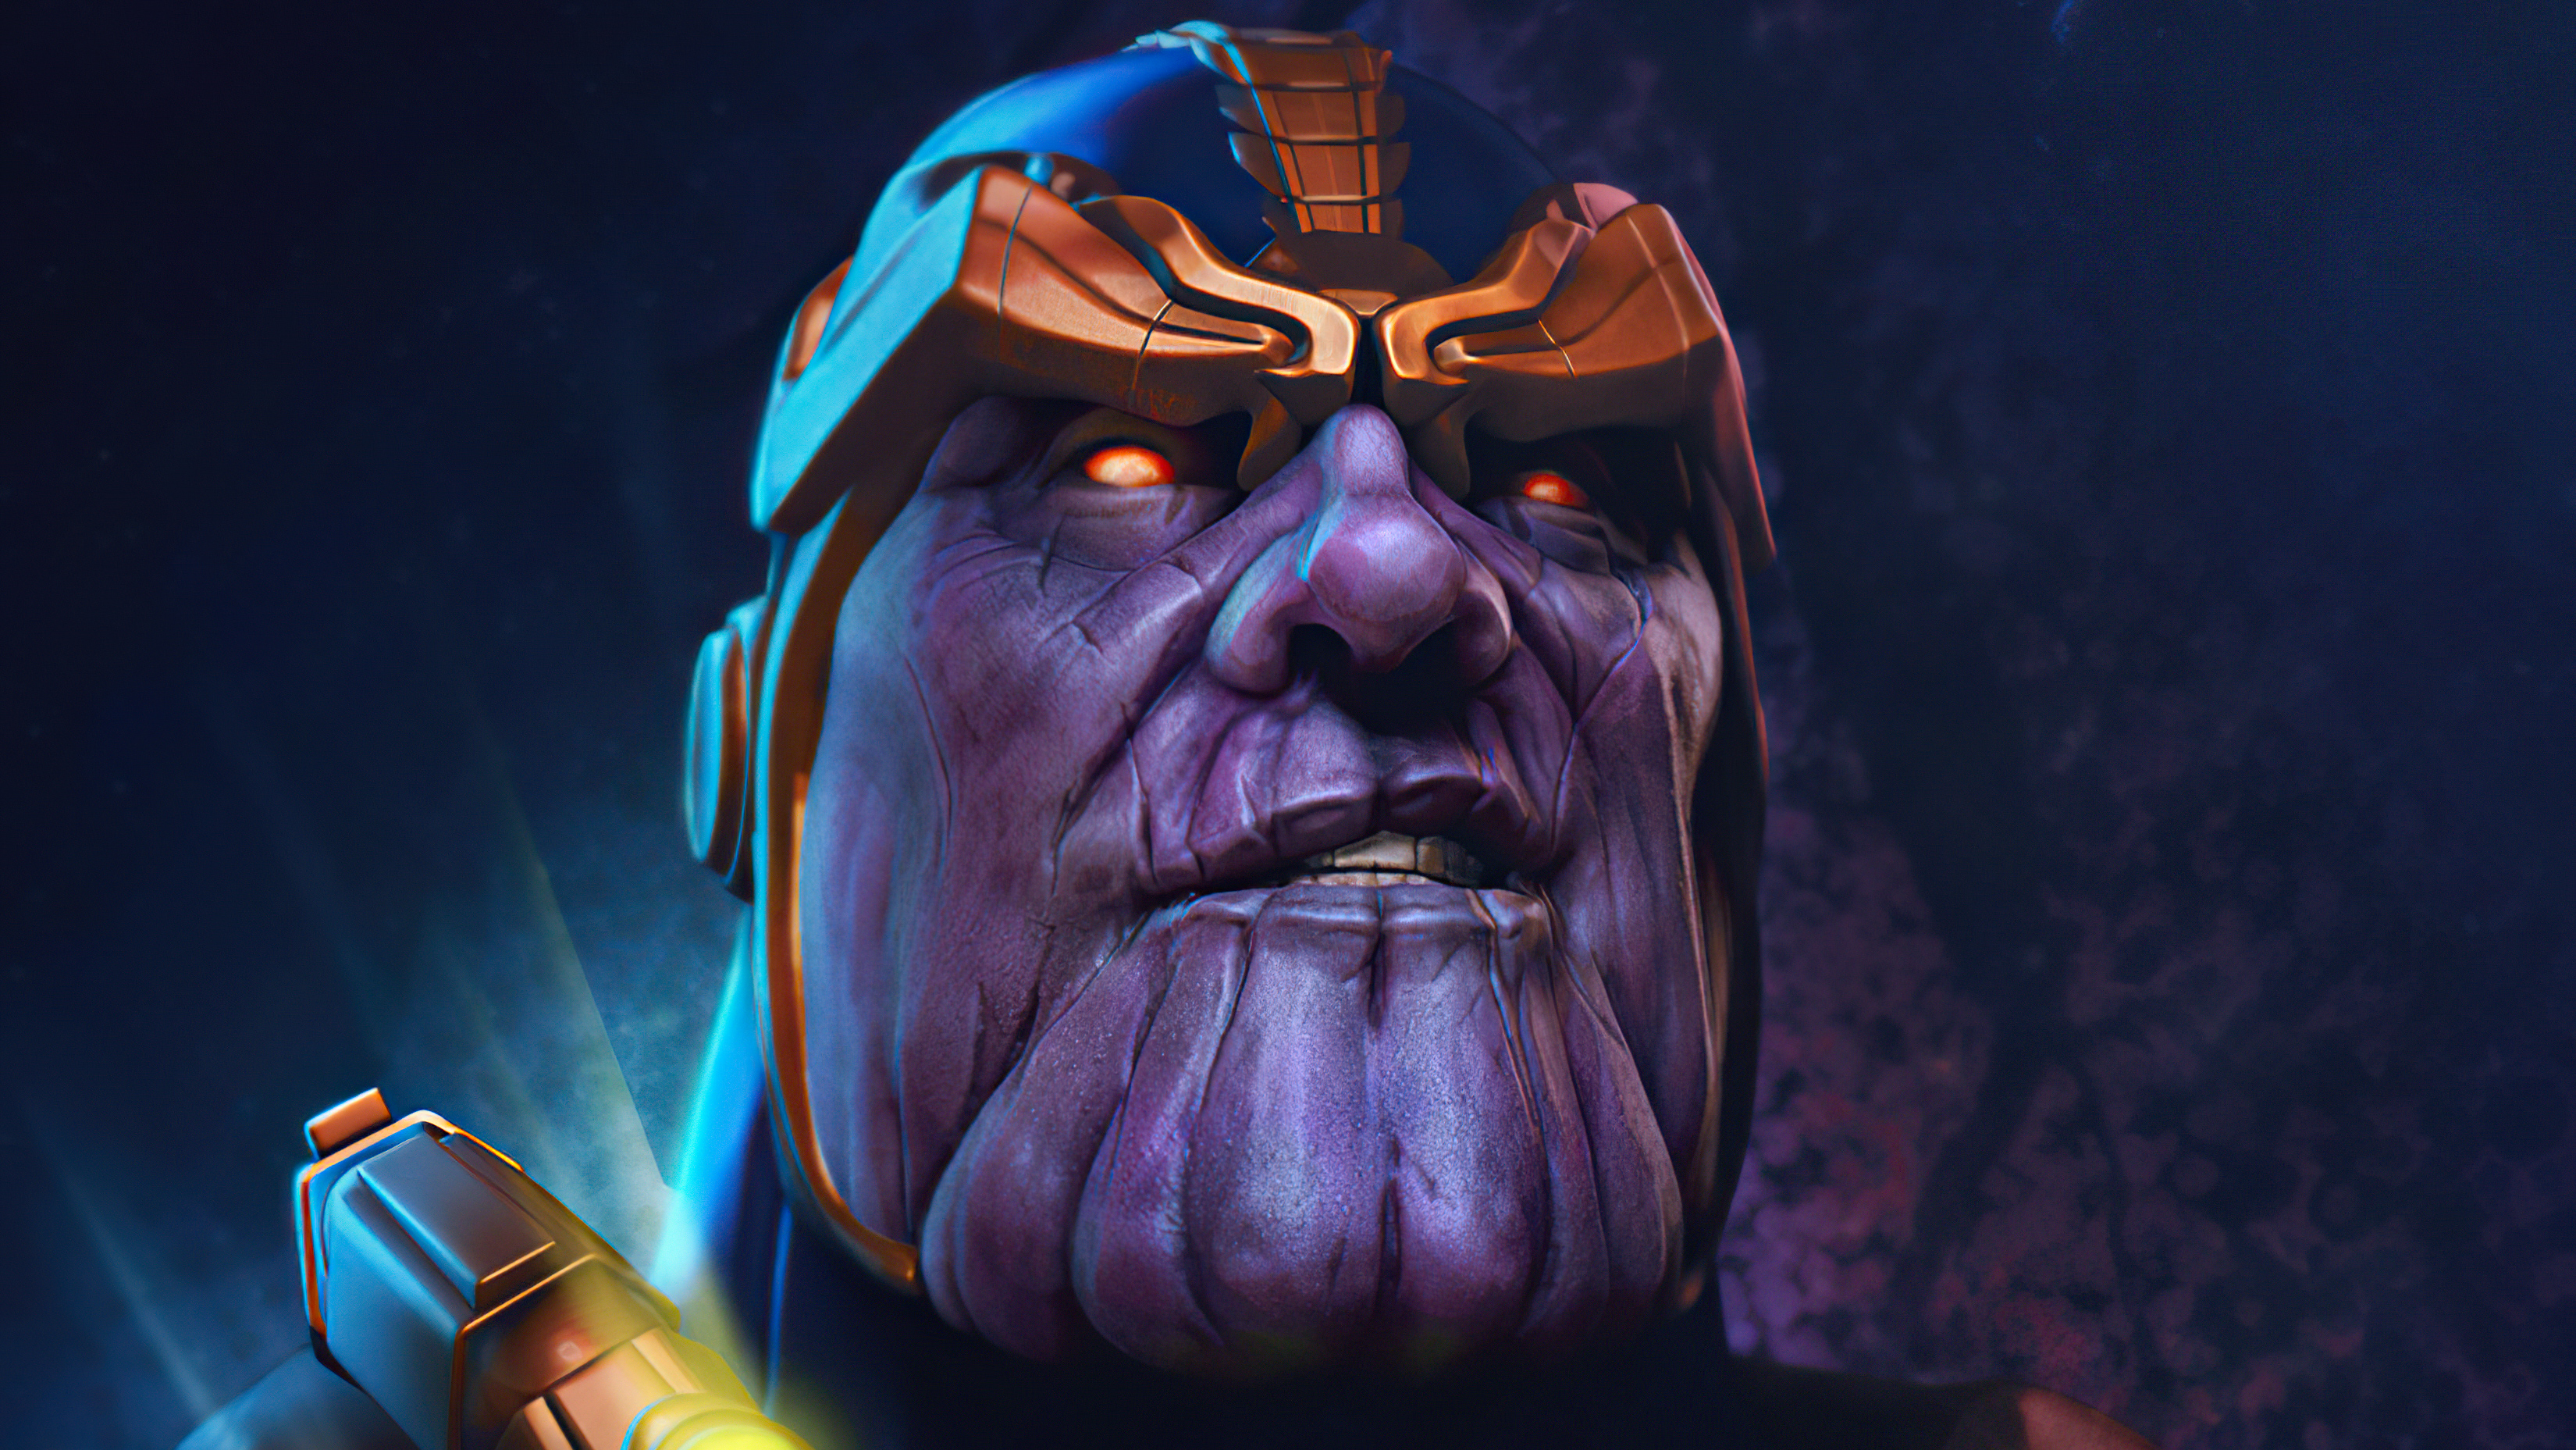 Wallpaper Thanos Artwork